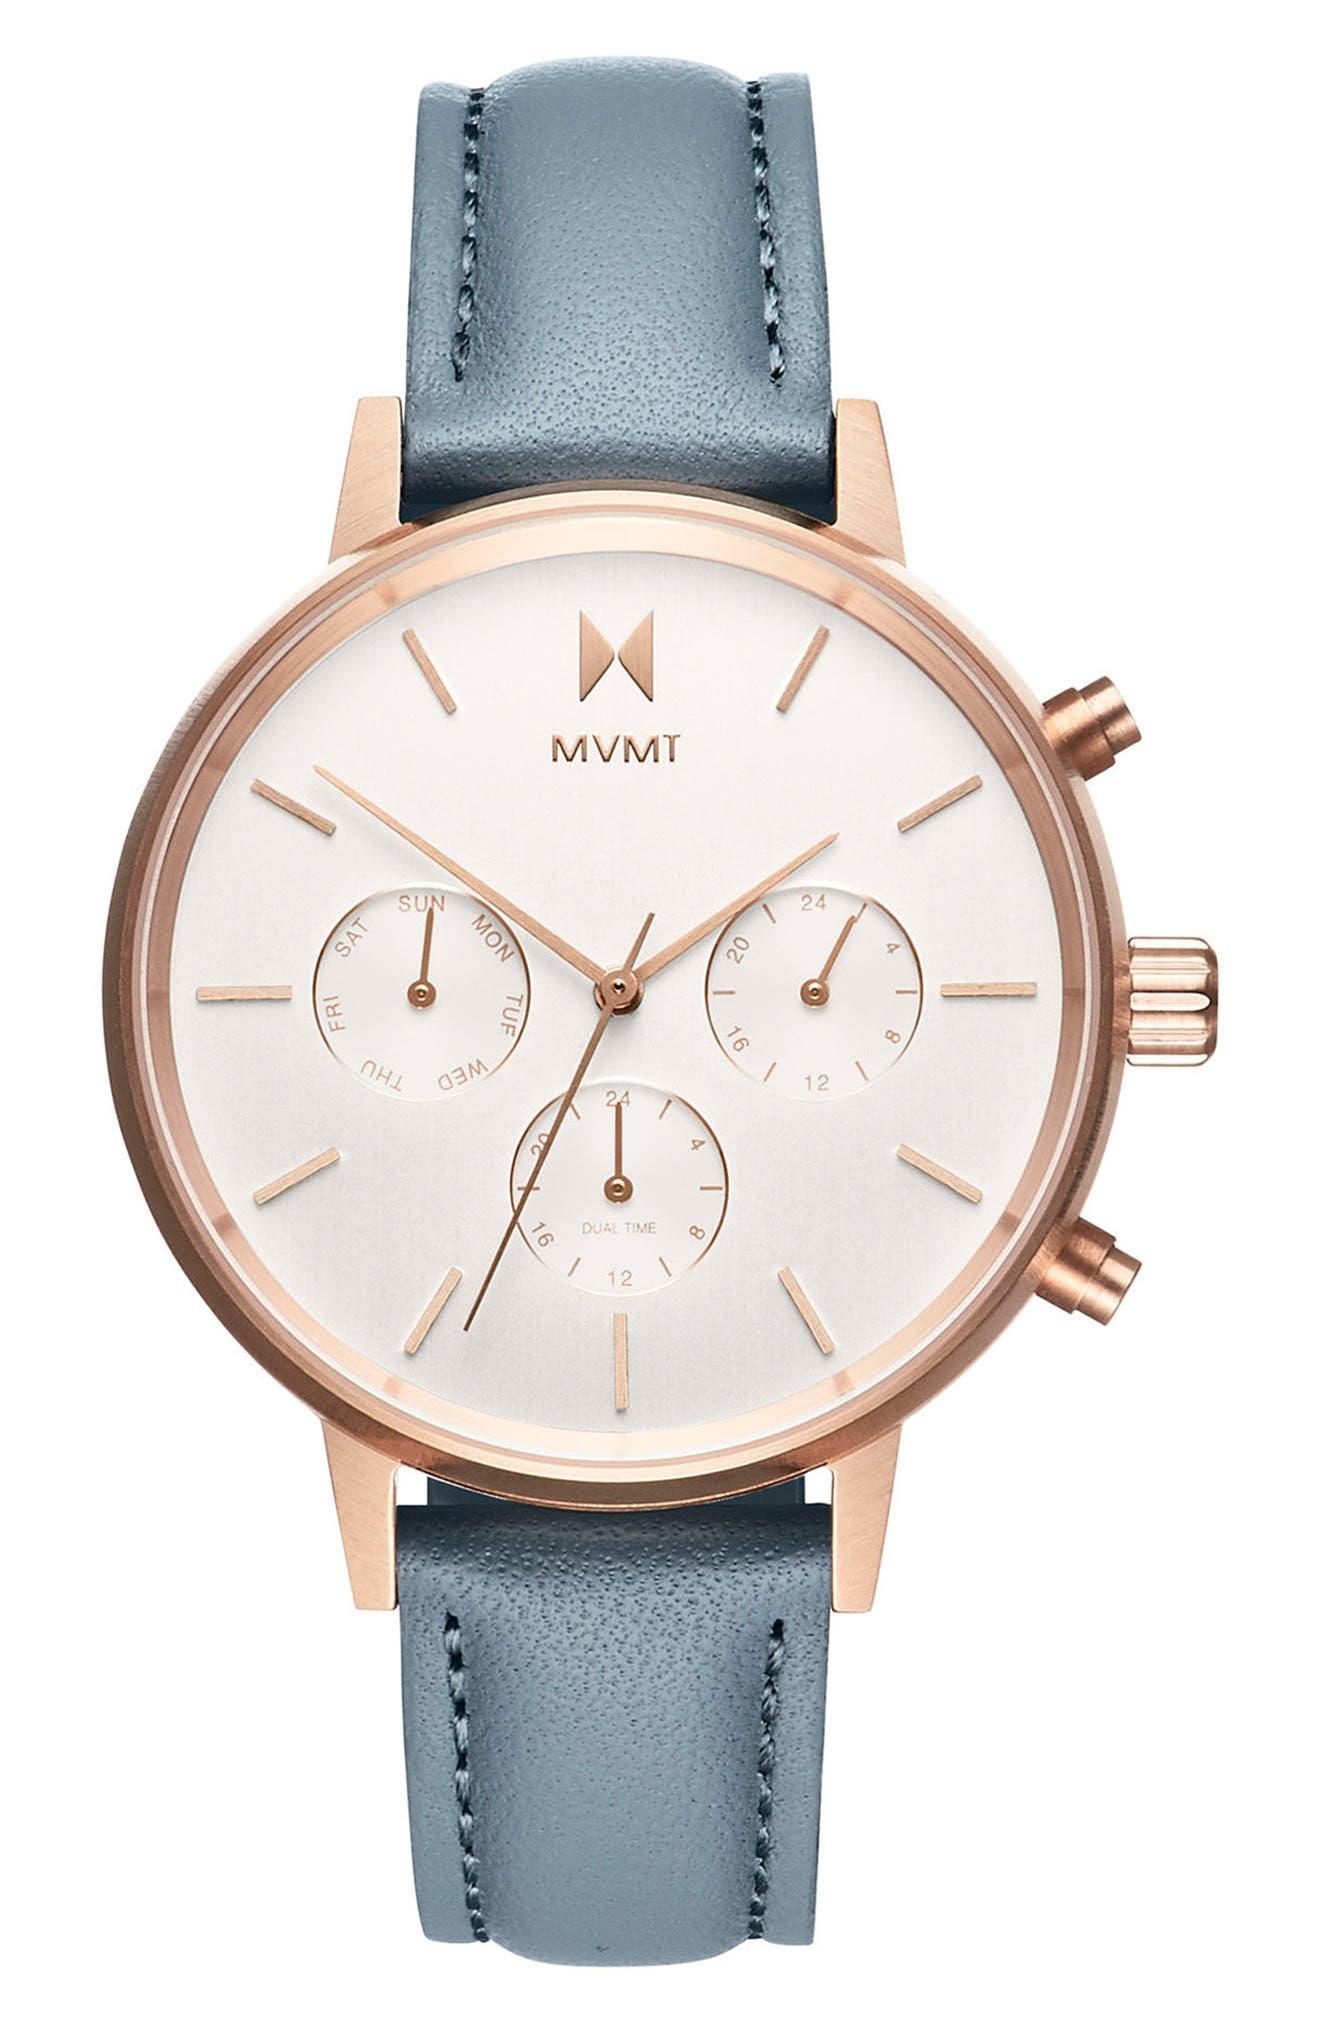 MVMT Nova Chronograph Leather Strap Watch, 38mm, Main, color, SLATE/ BEIGE/ ROSE GOLD